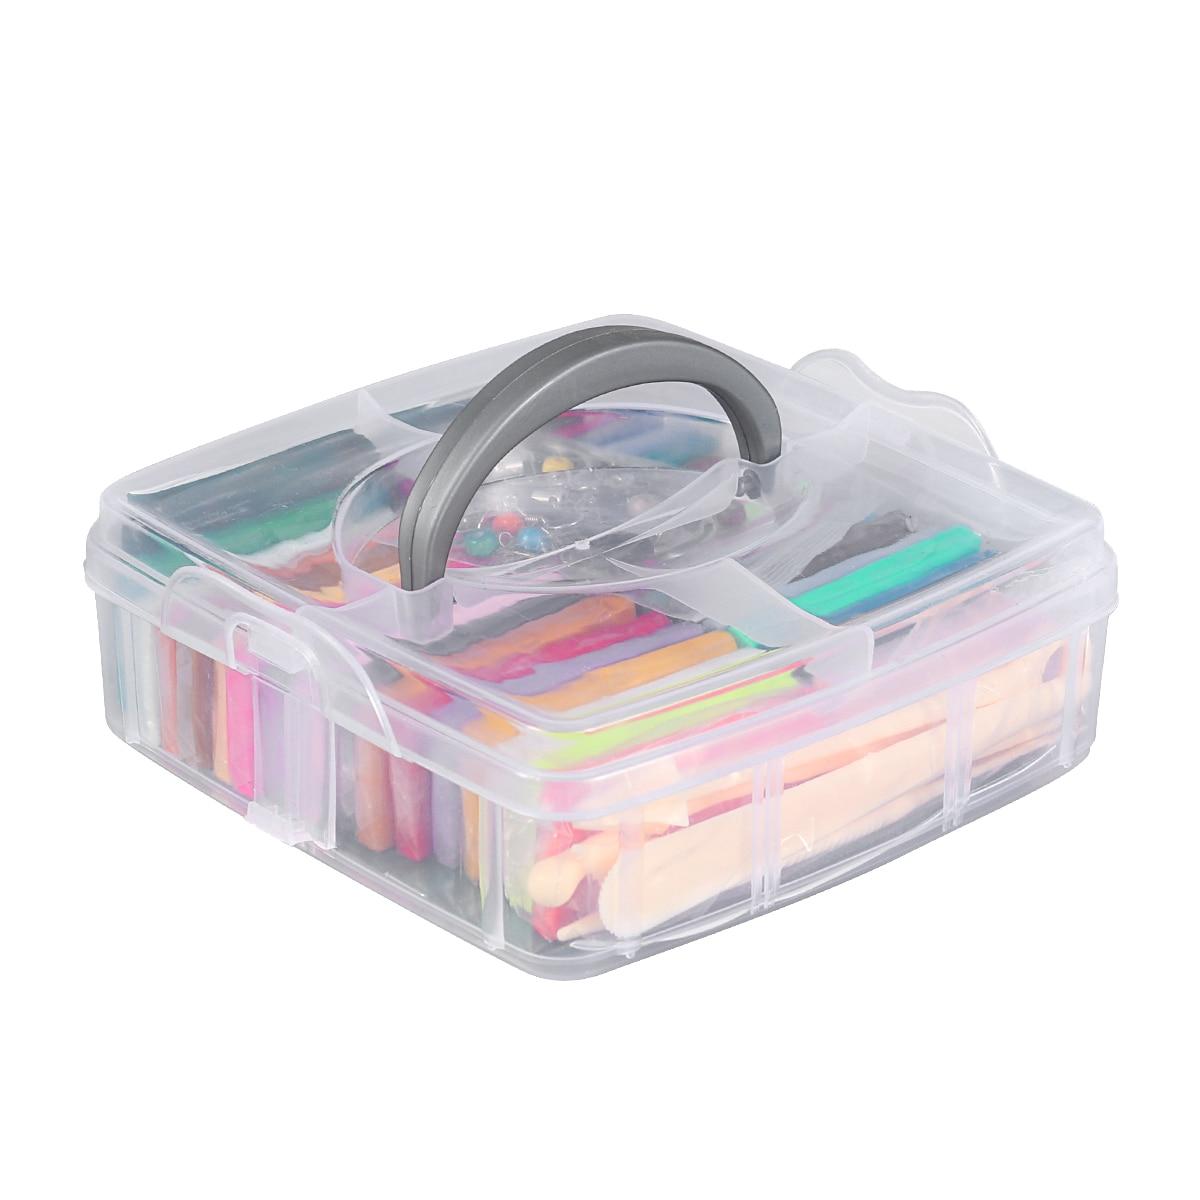 Kit de arcilla de modelado de 32 colores para hornear arcilla polimérica DIY Kit creativo de modelado de bloques de arcilla juguetes para chico y niño